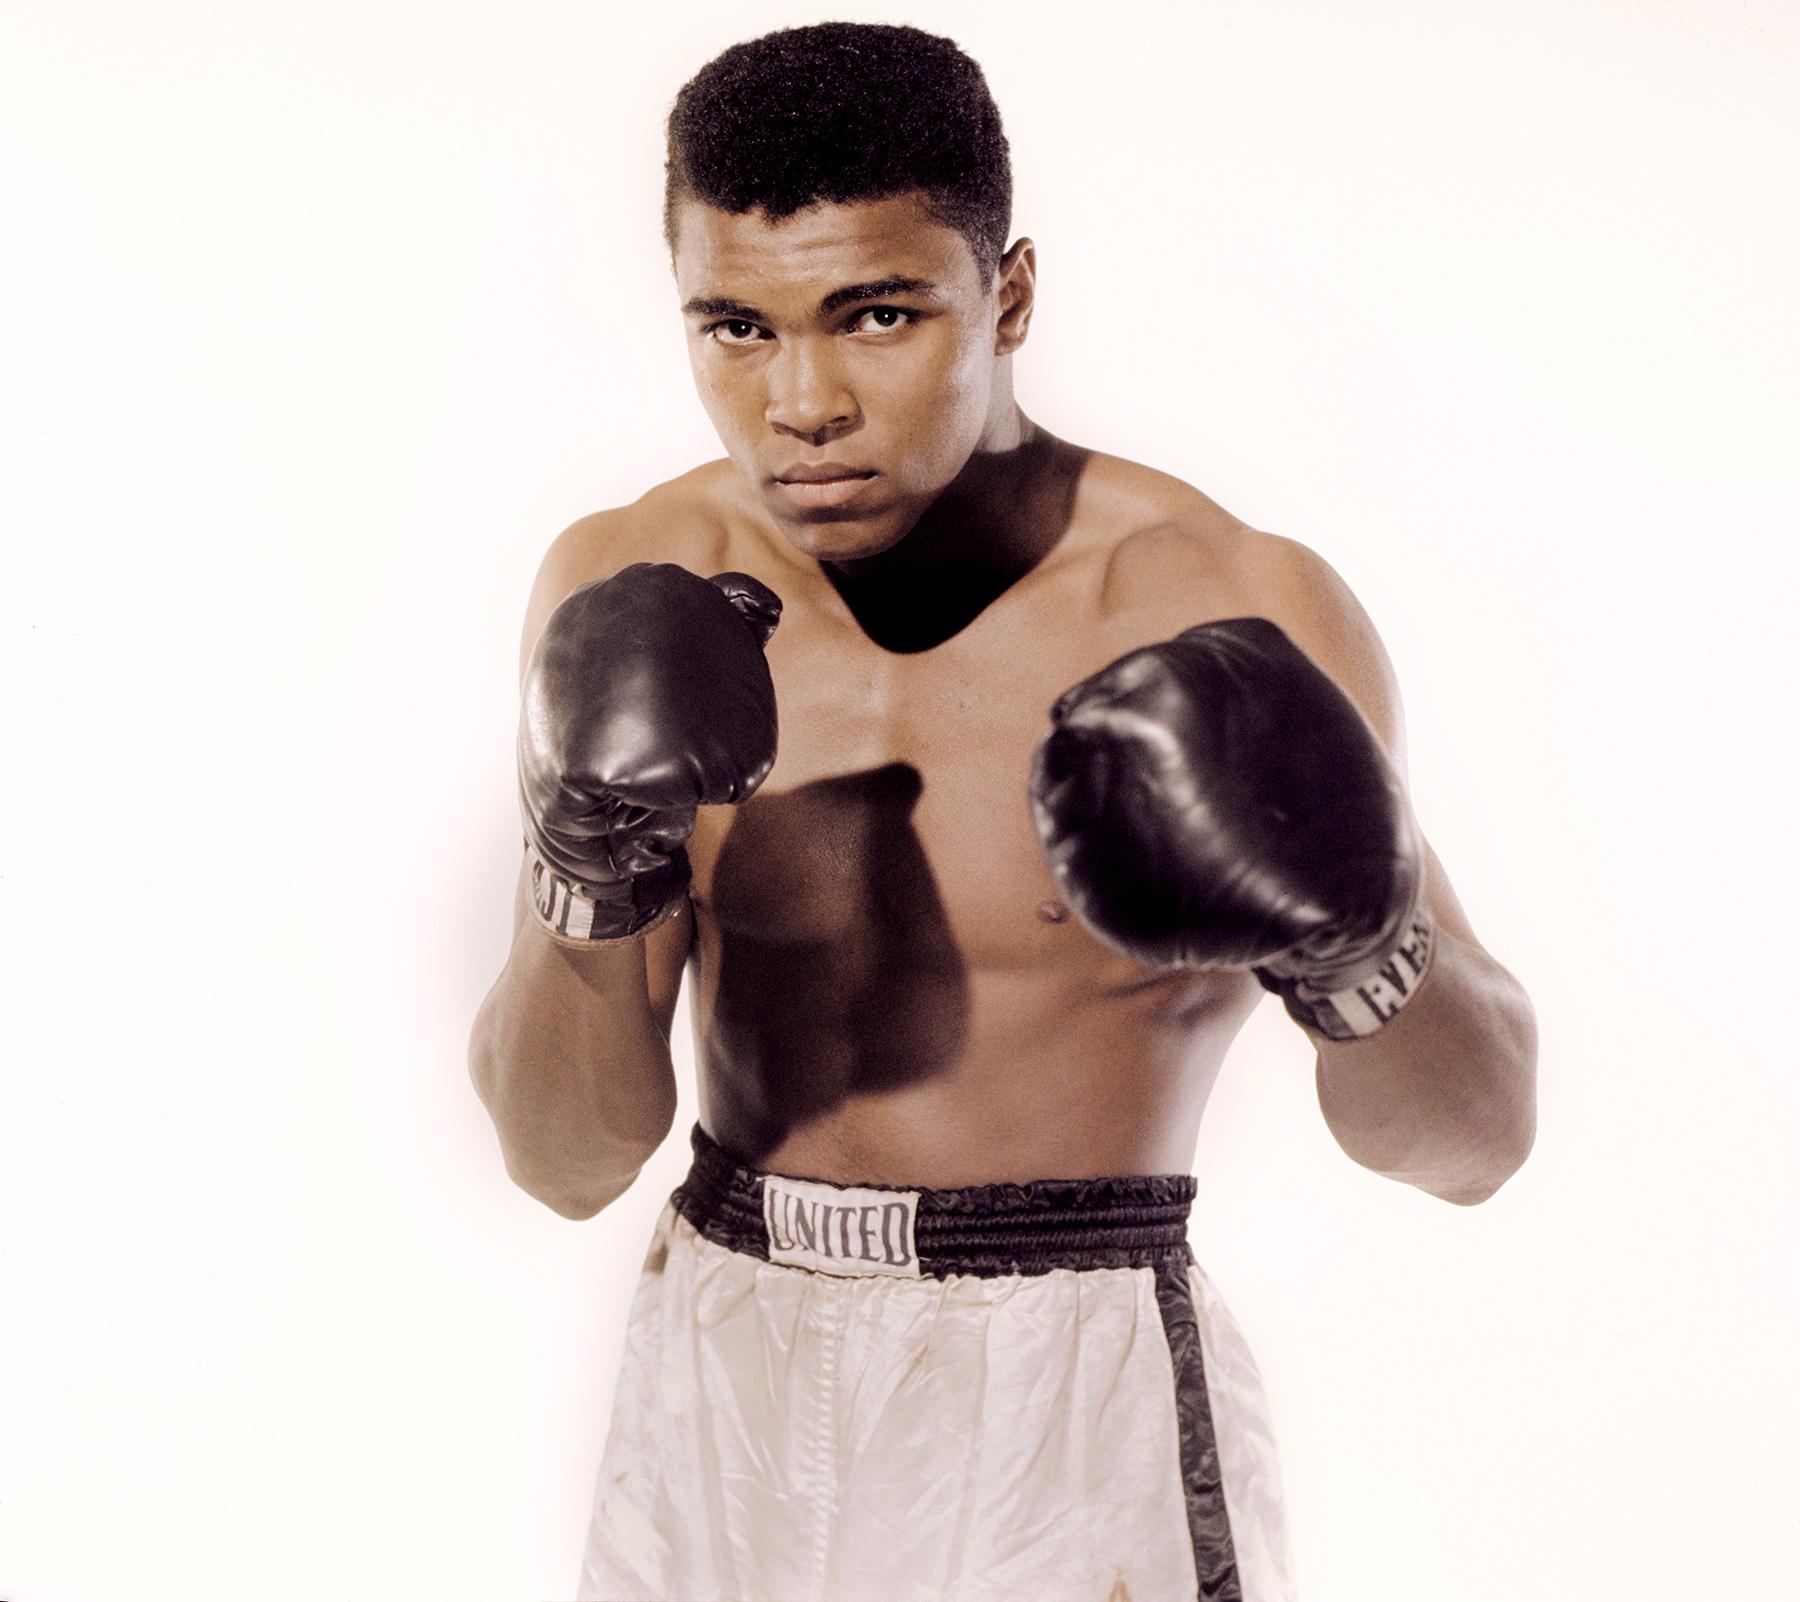 Watch Muhammad Ali's Funeral Livestream Here